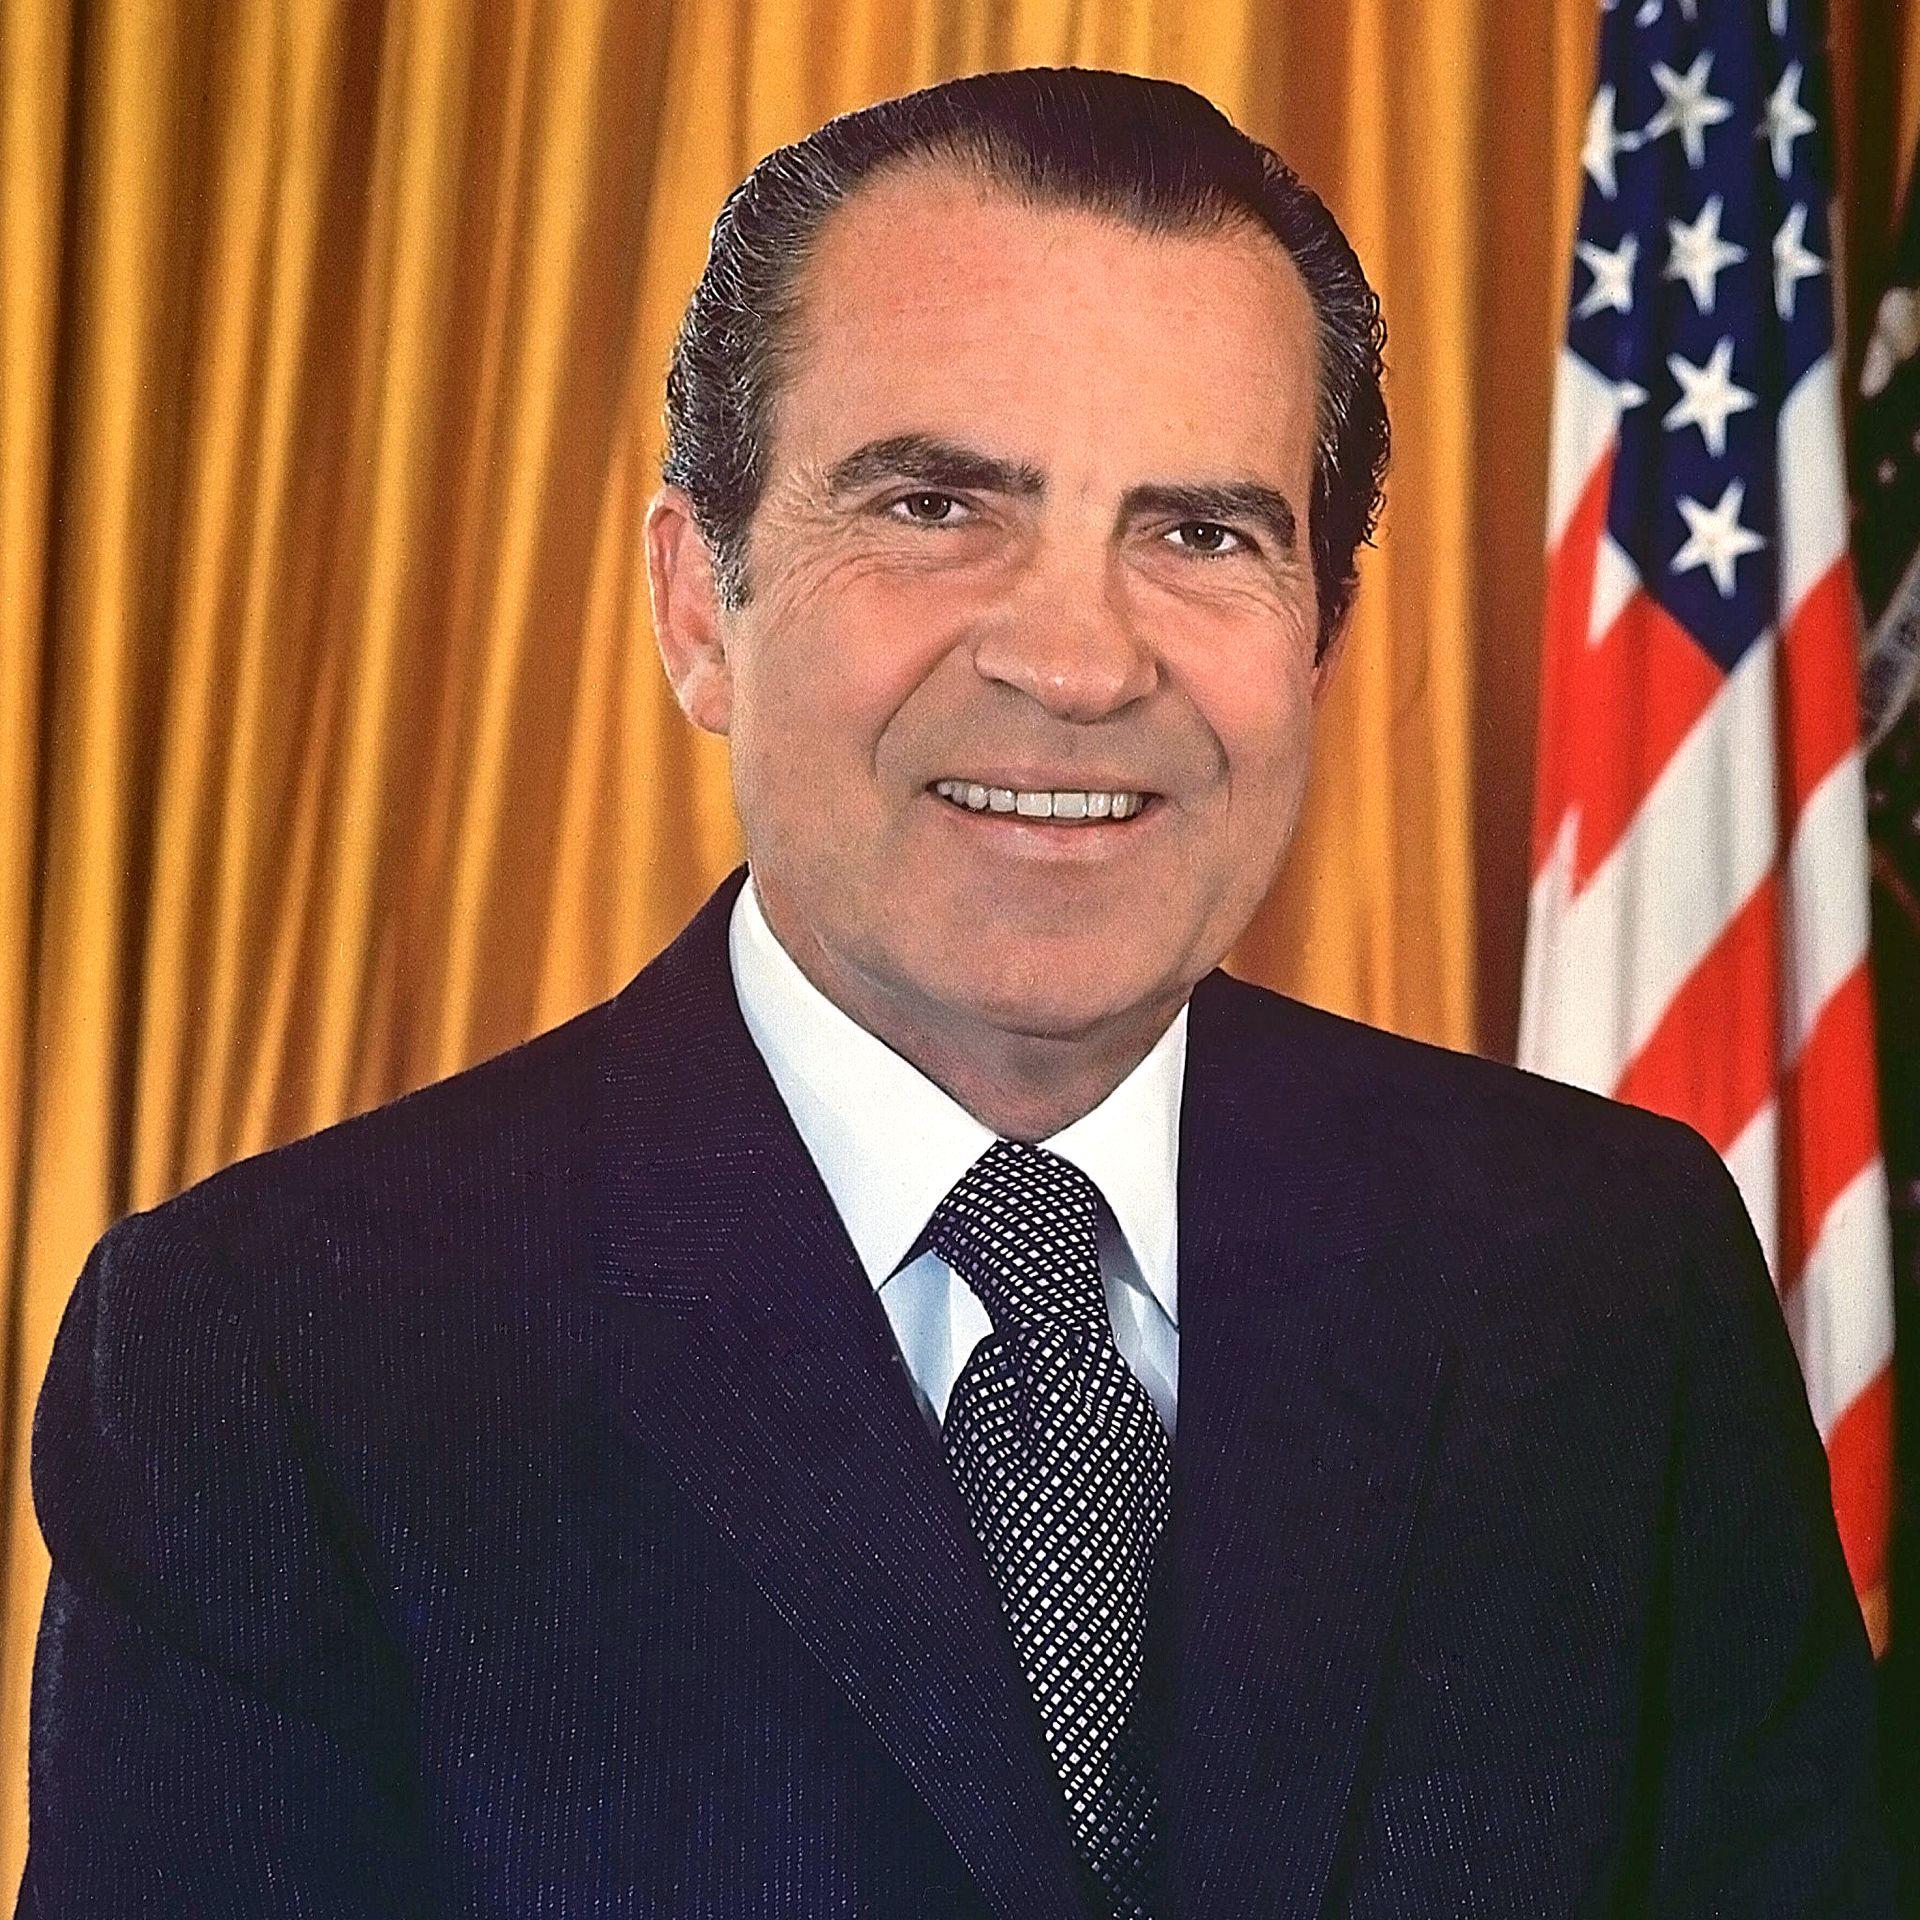 Nixon: President Richard Nixon